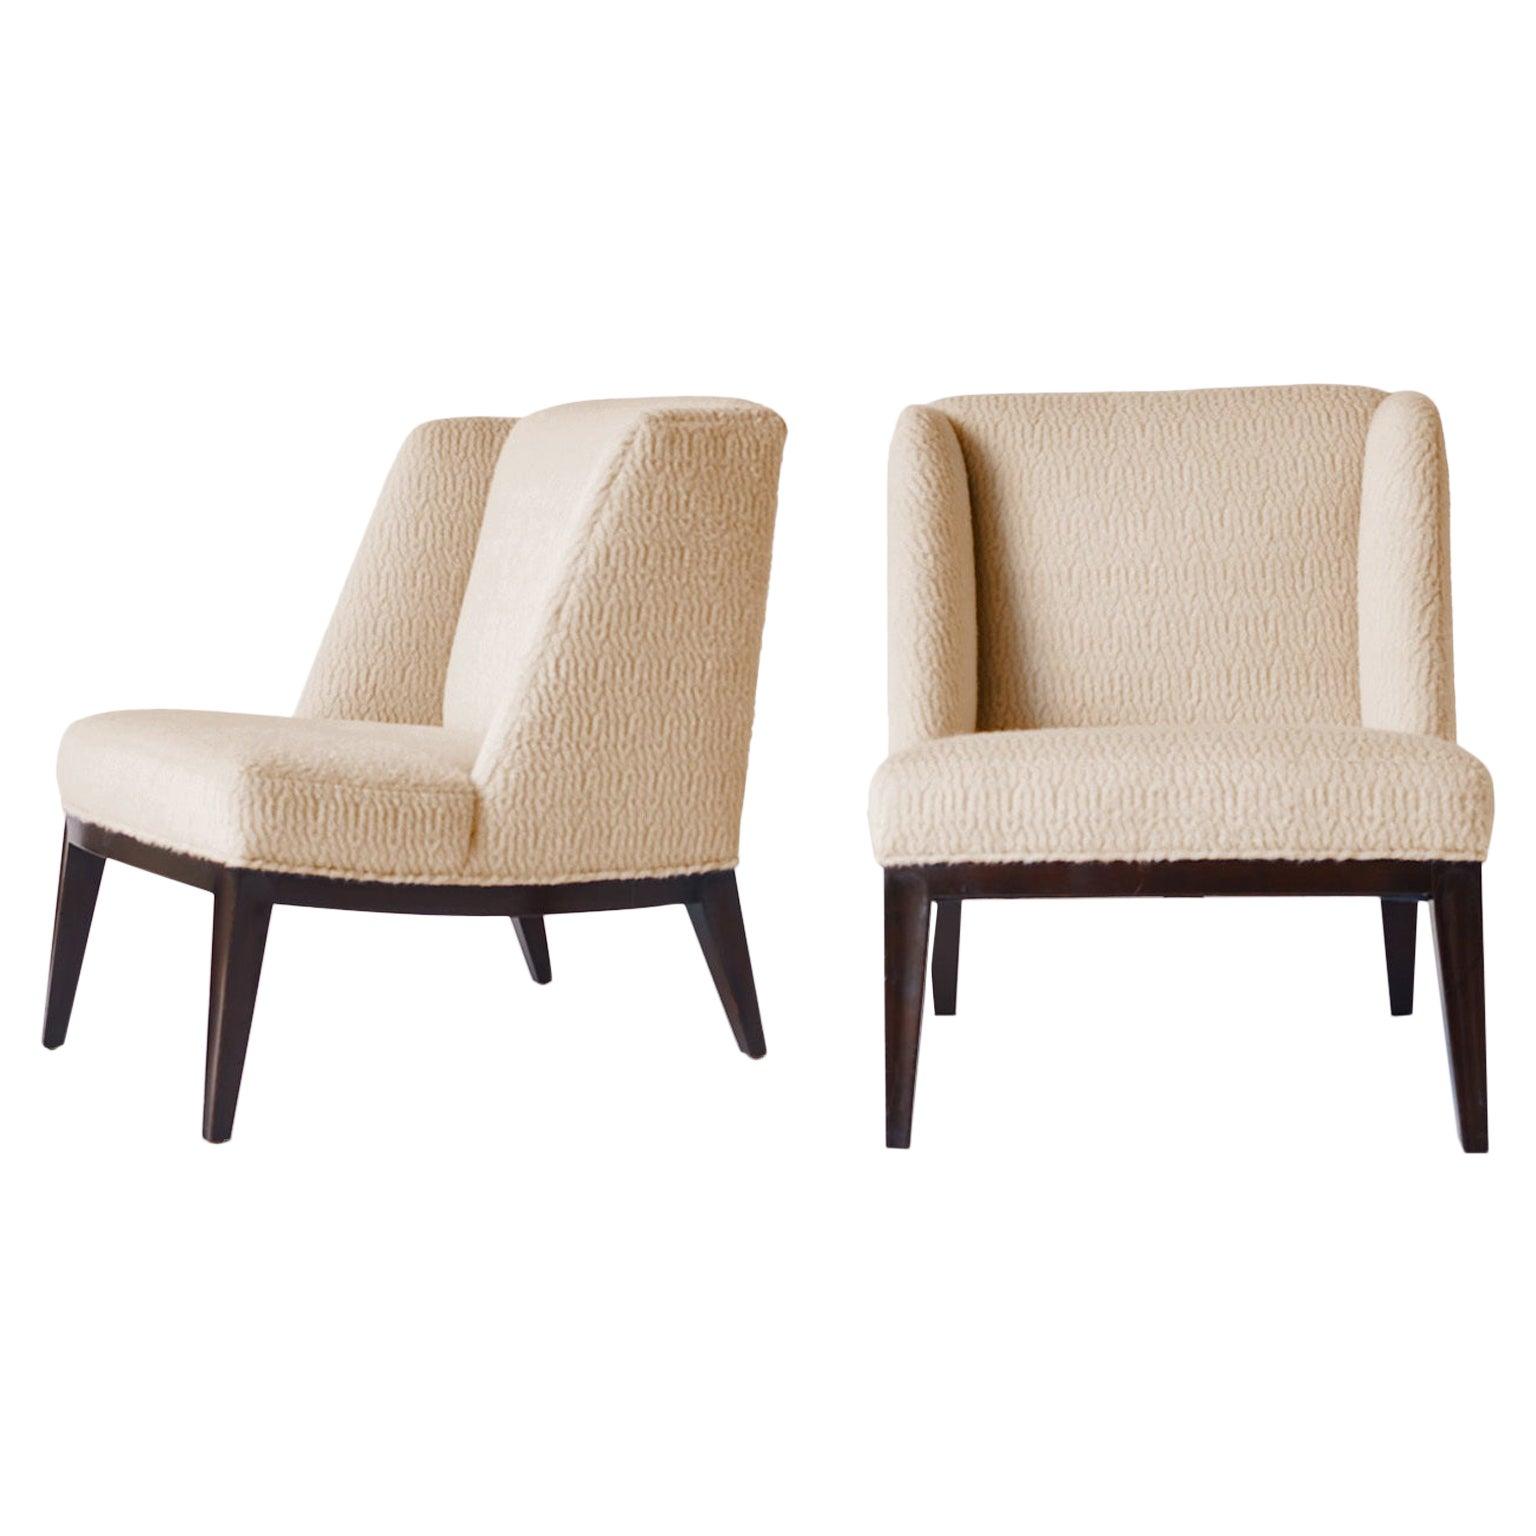 Edward Wormley Lounge Chairs